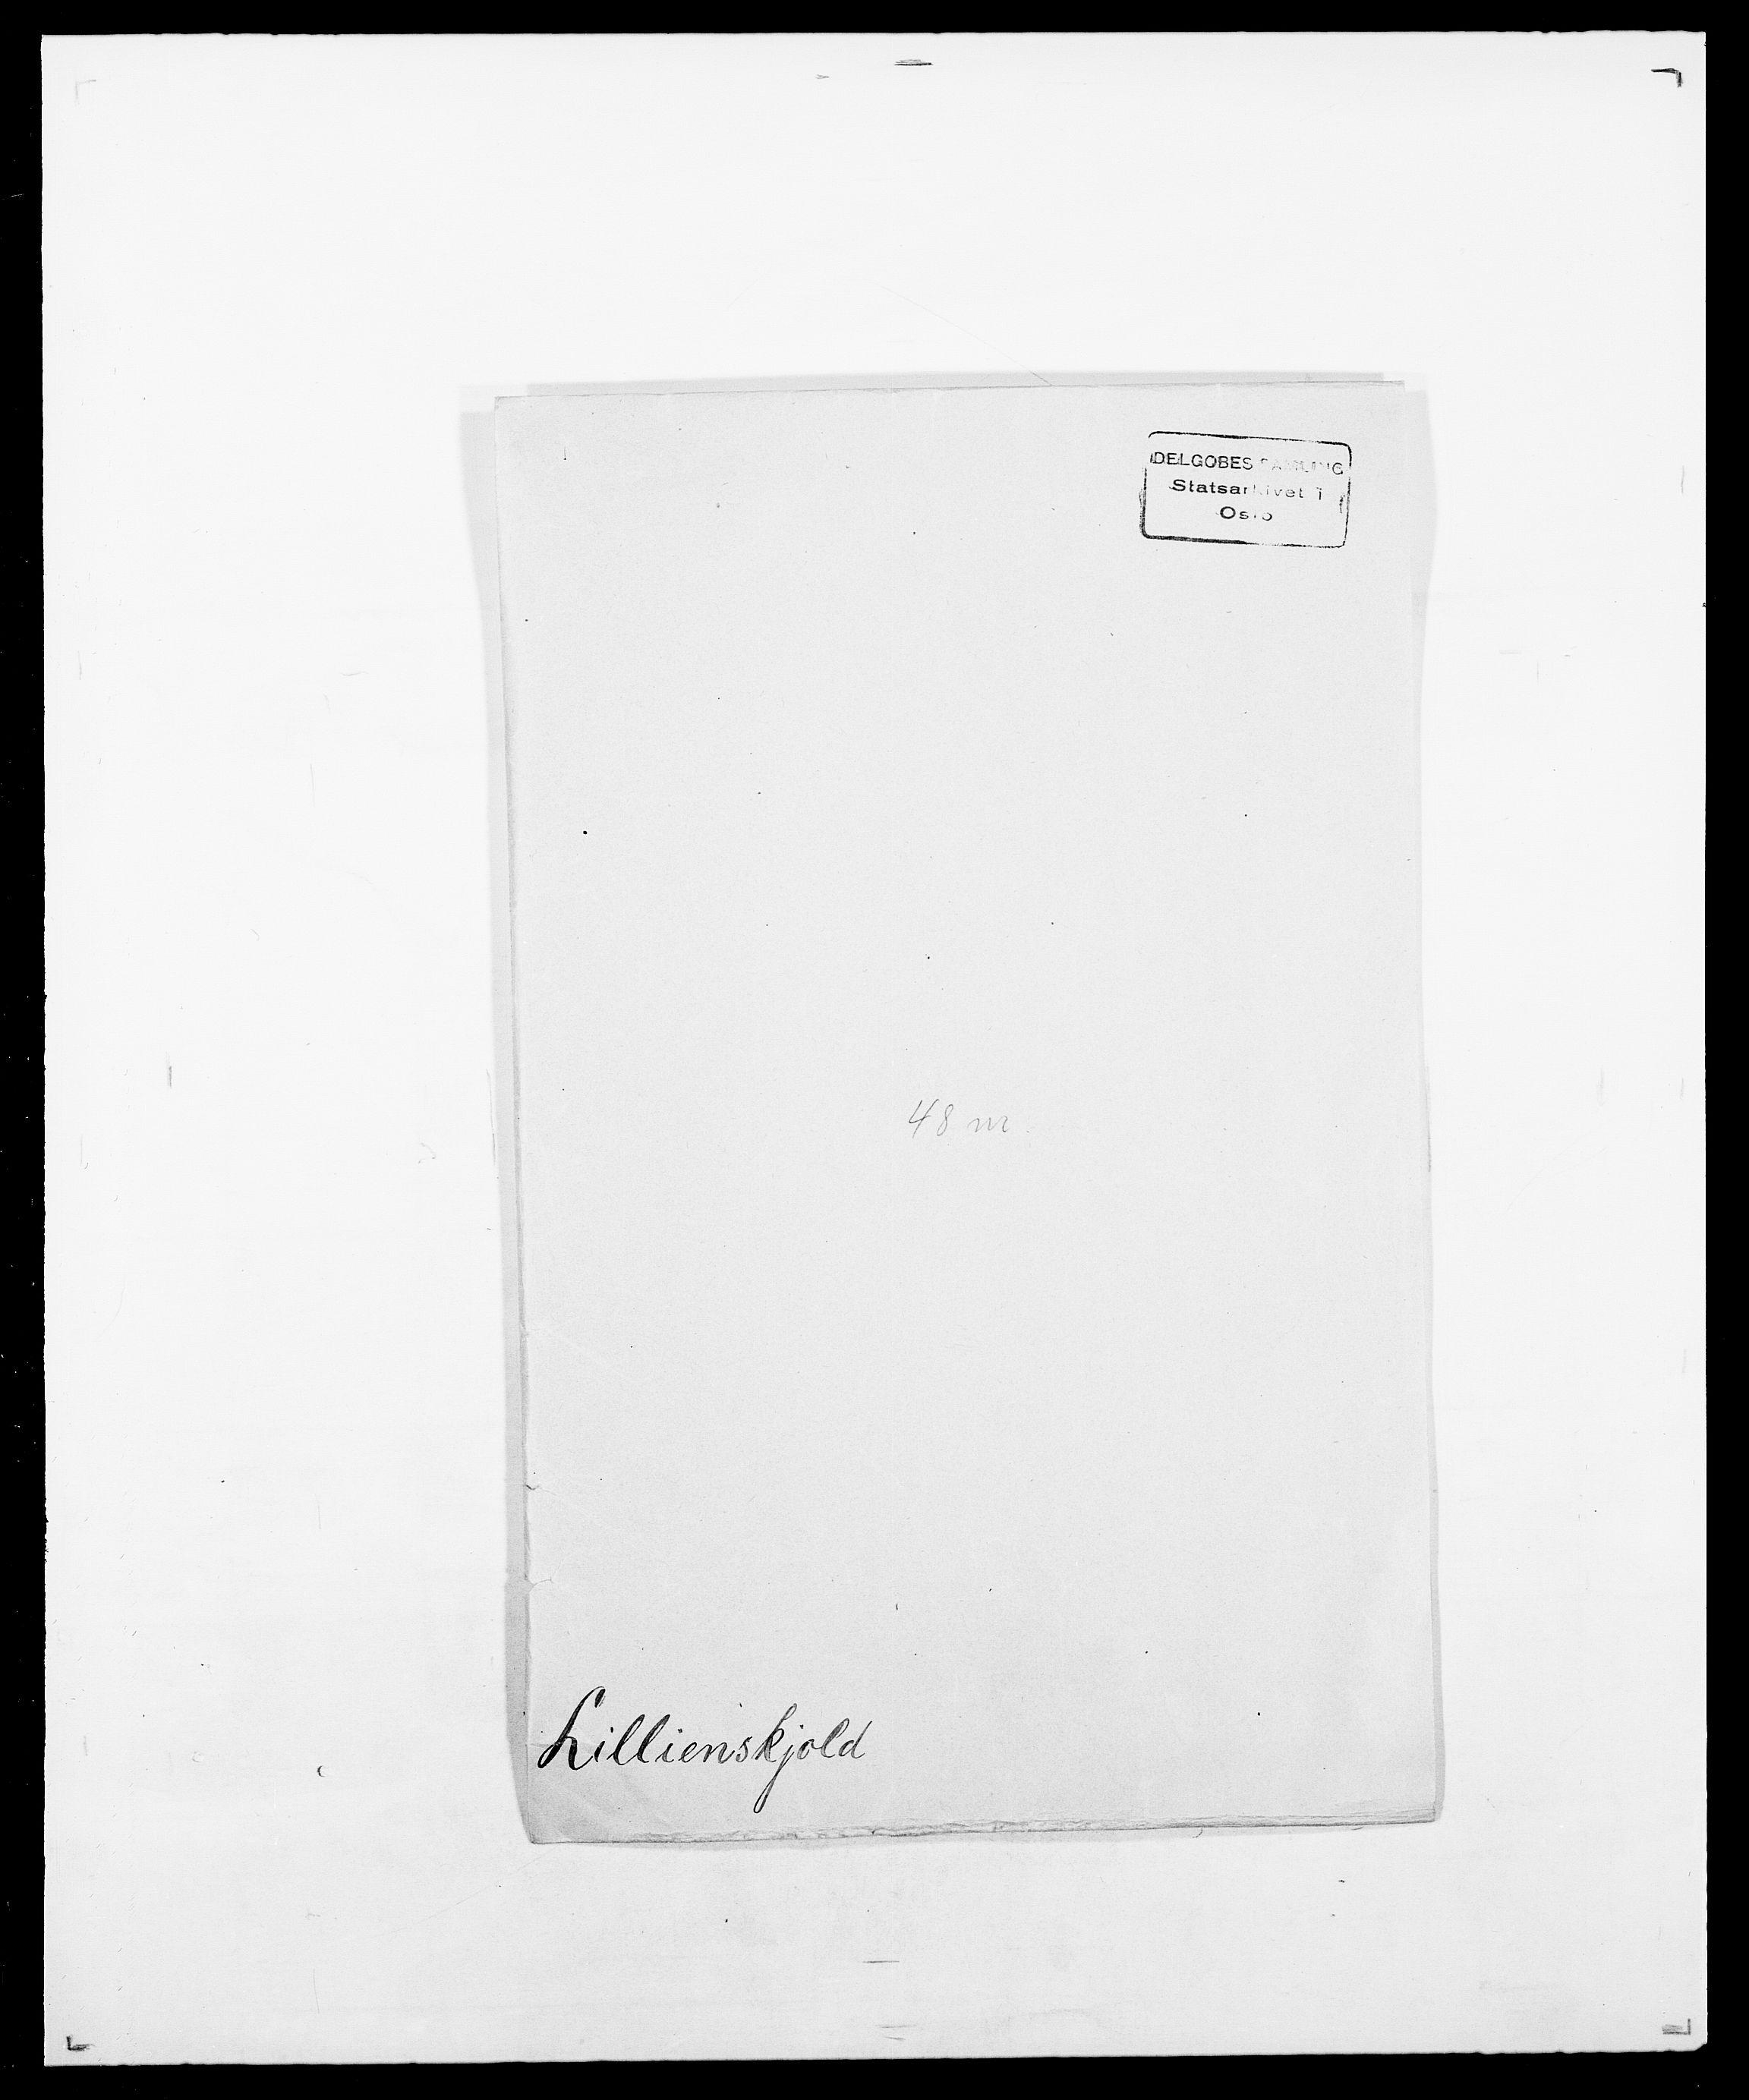 SAO, Delgobe, Charles Antoine - samling, D/Da/L0023: Lau - Lirvyn, s. 416